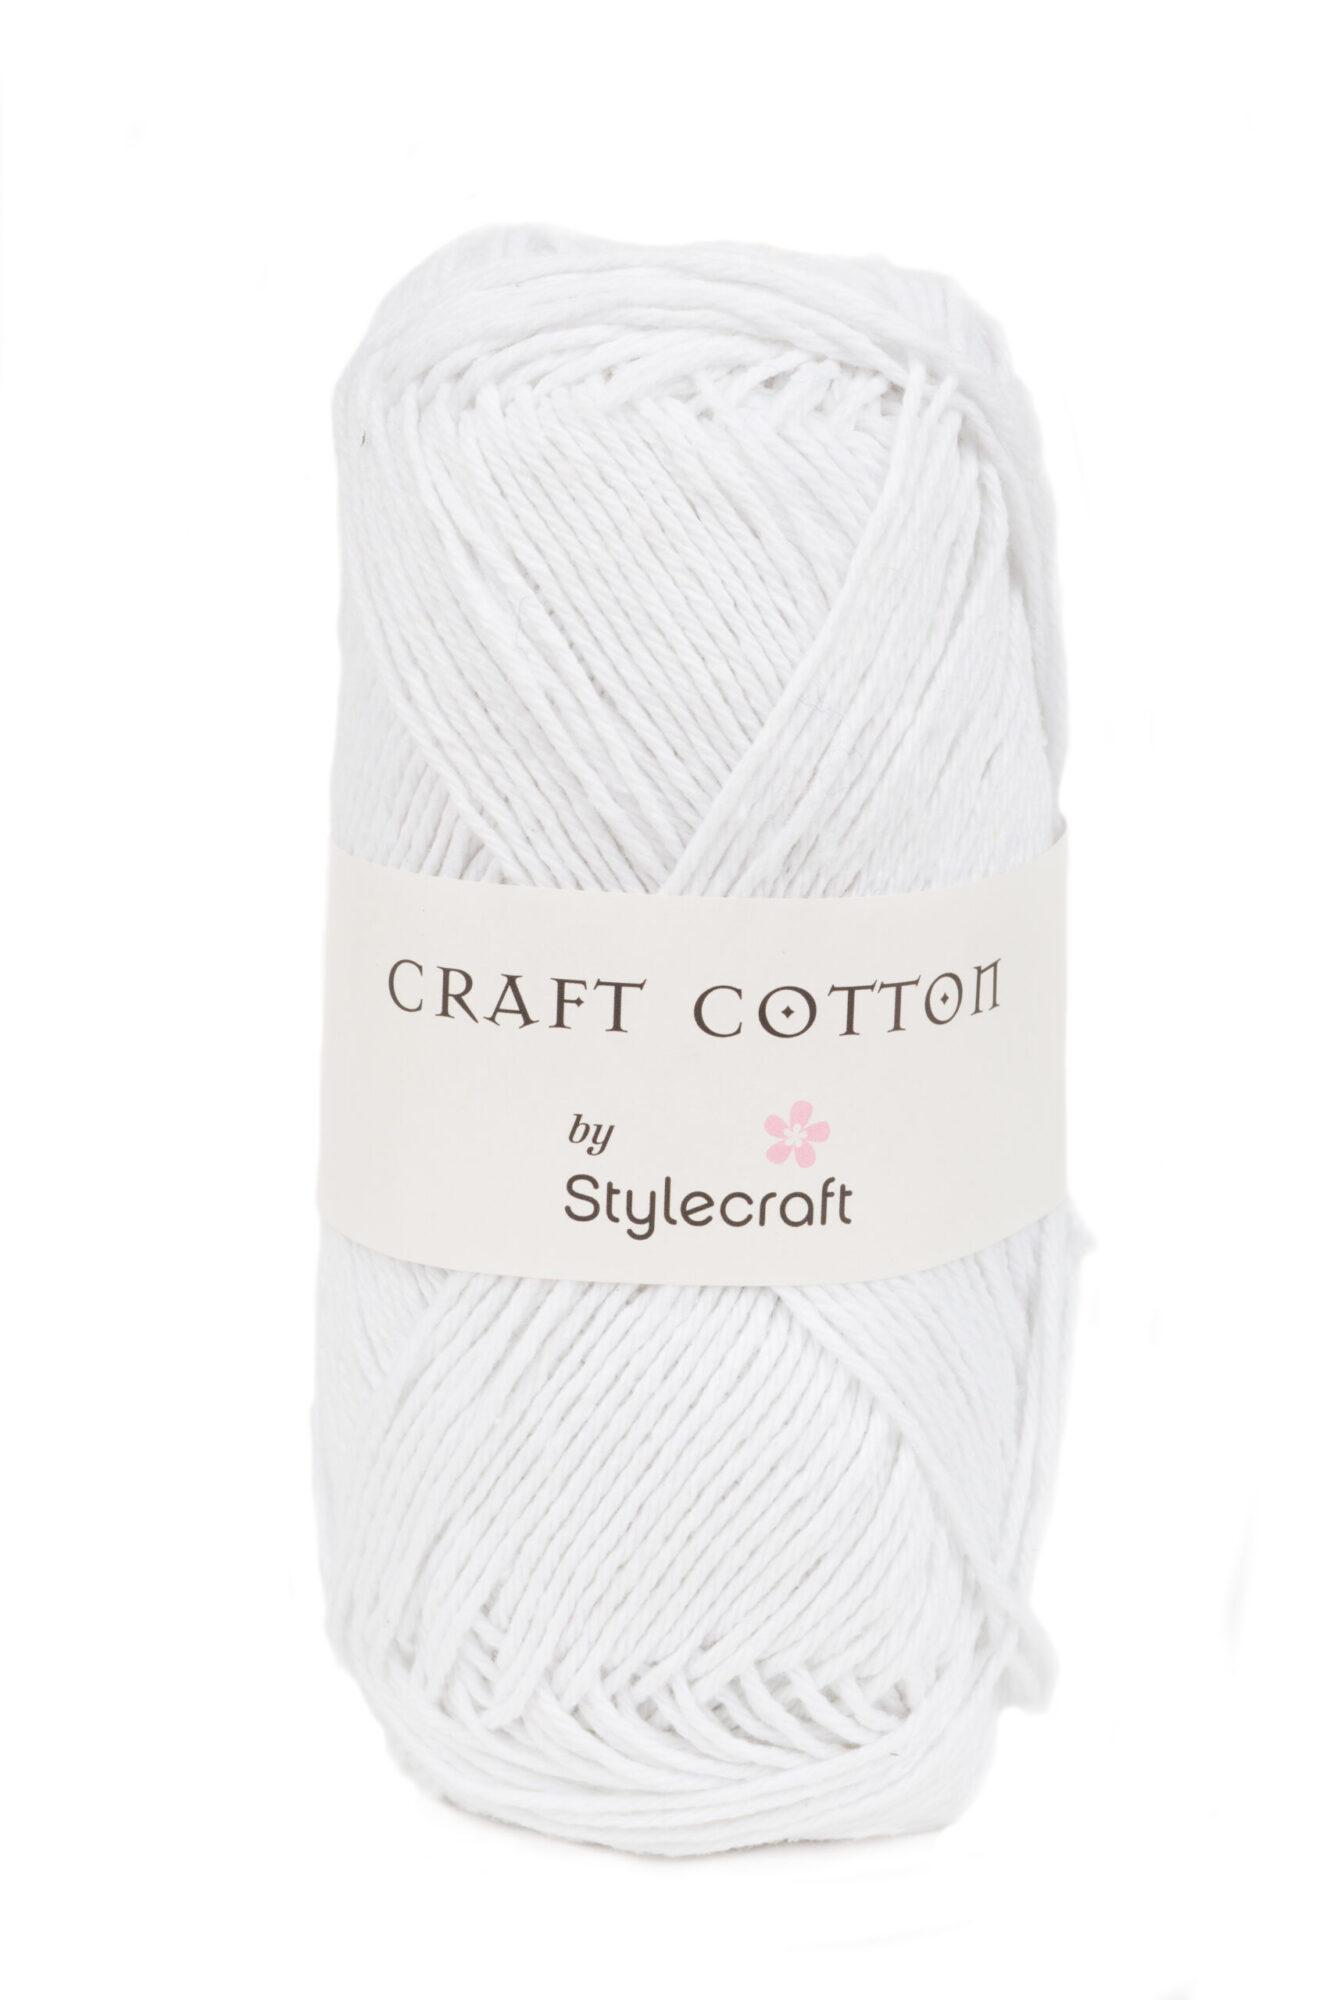 Stylecraft Craft Cotton product image